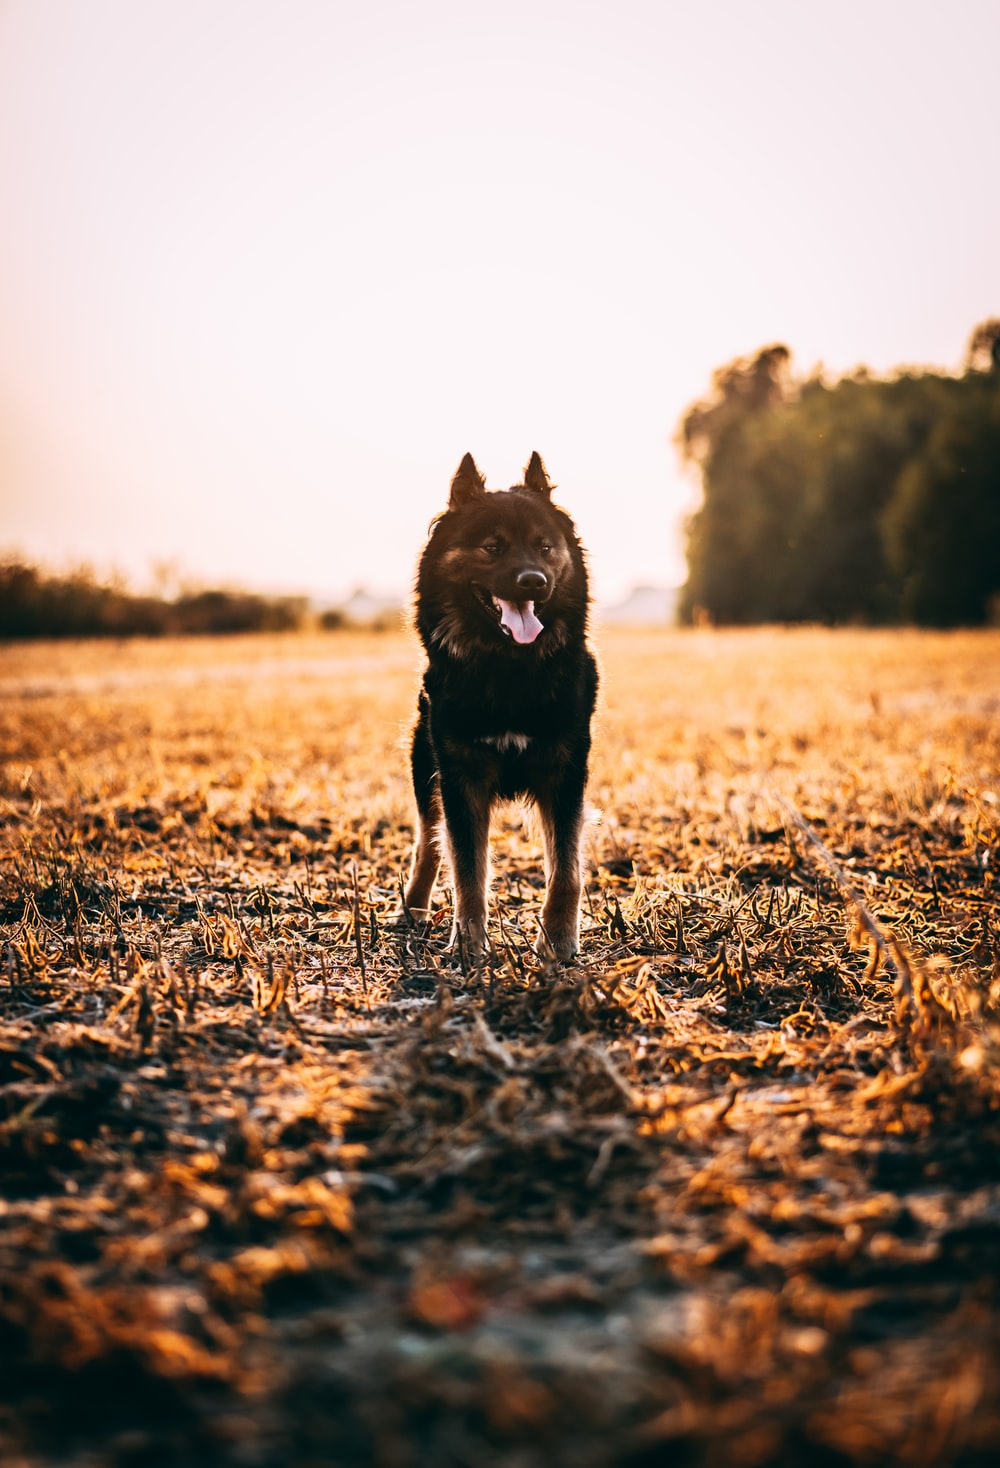 black short coat medium dog on brown grass field during daytime